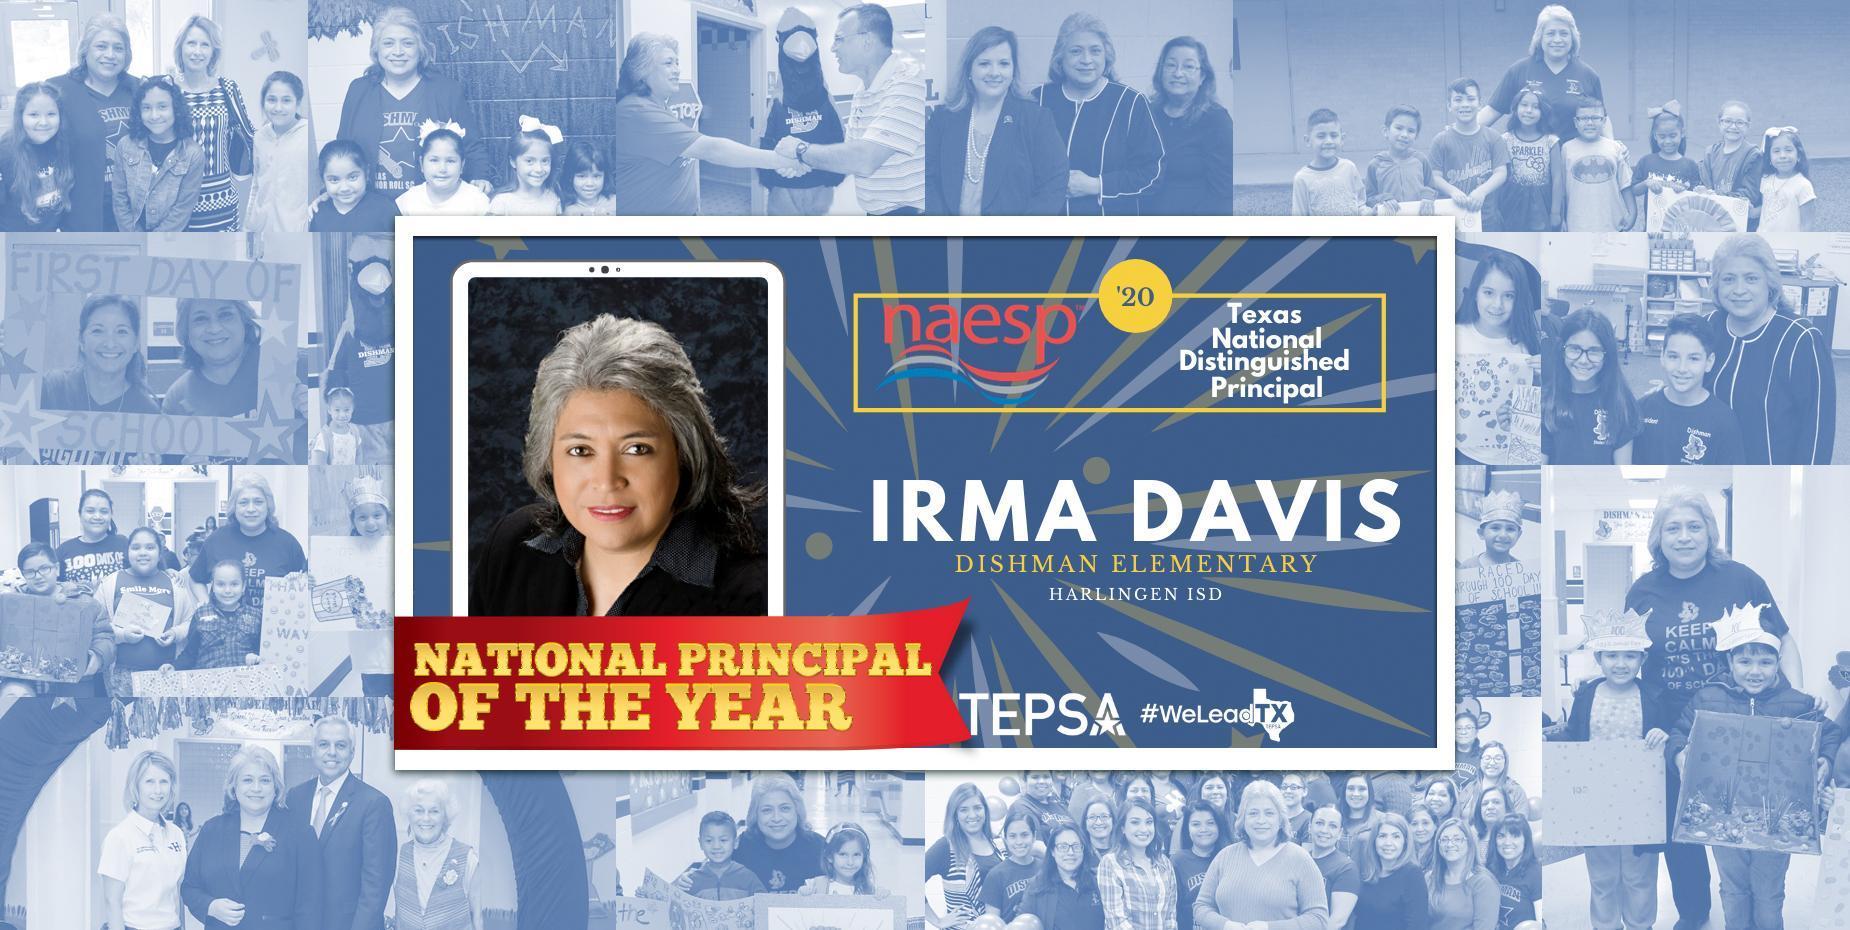 Dishman Elementary Principal named National Distinguished Principal